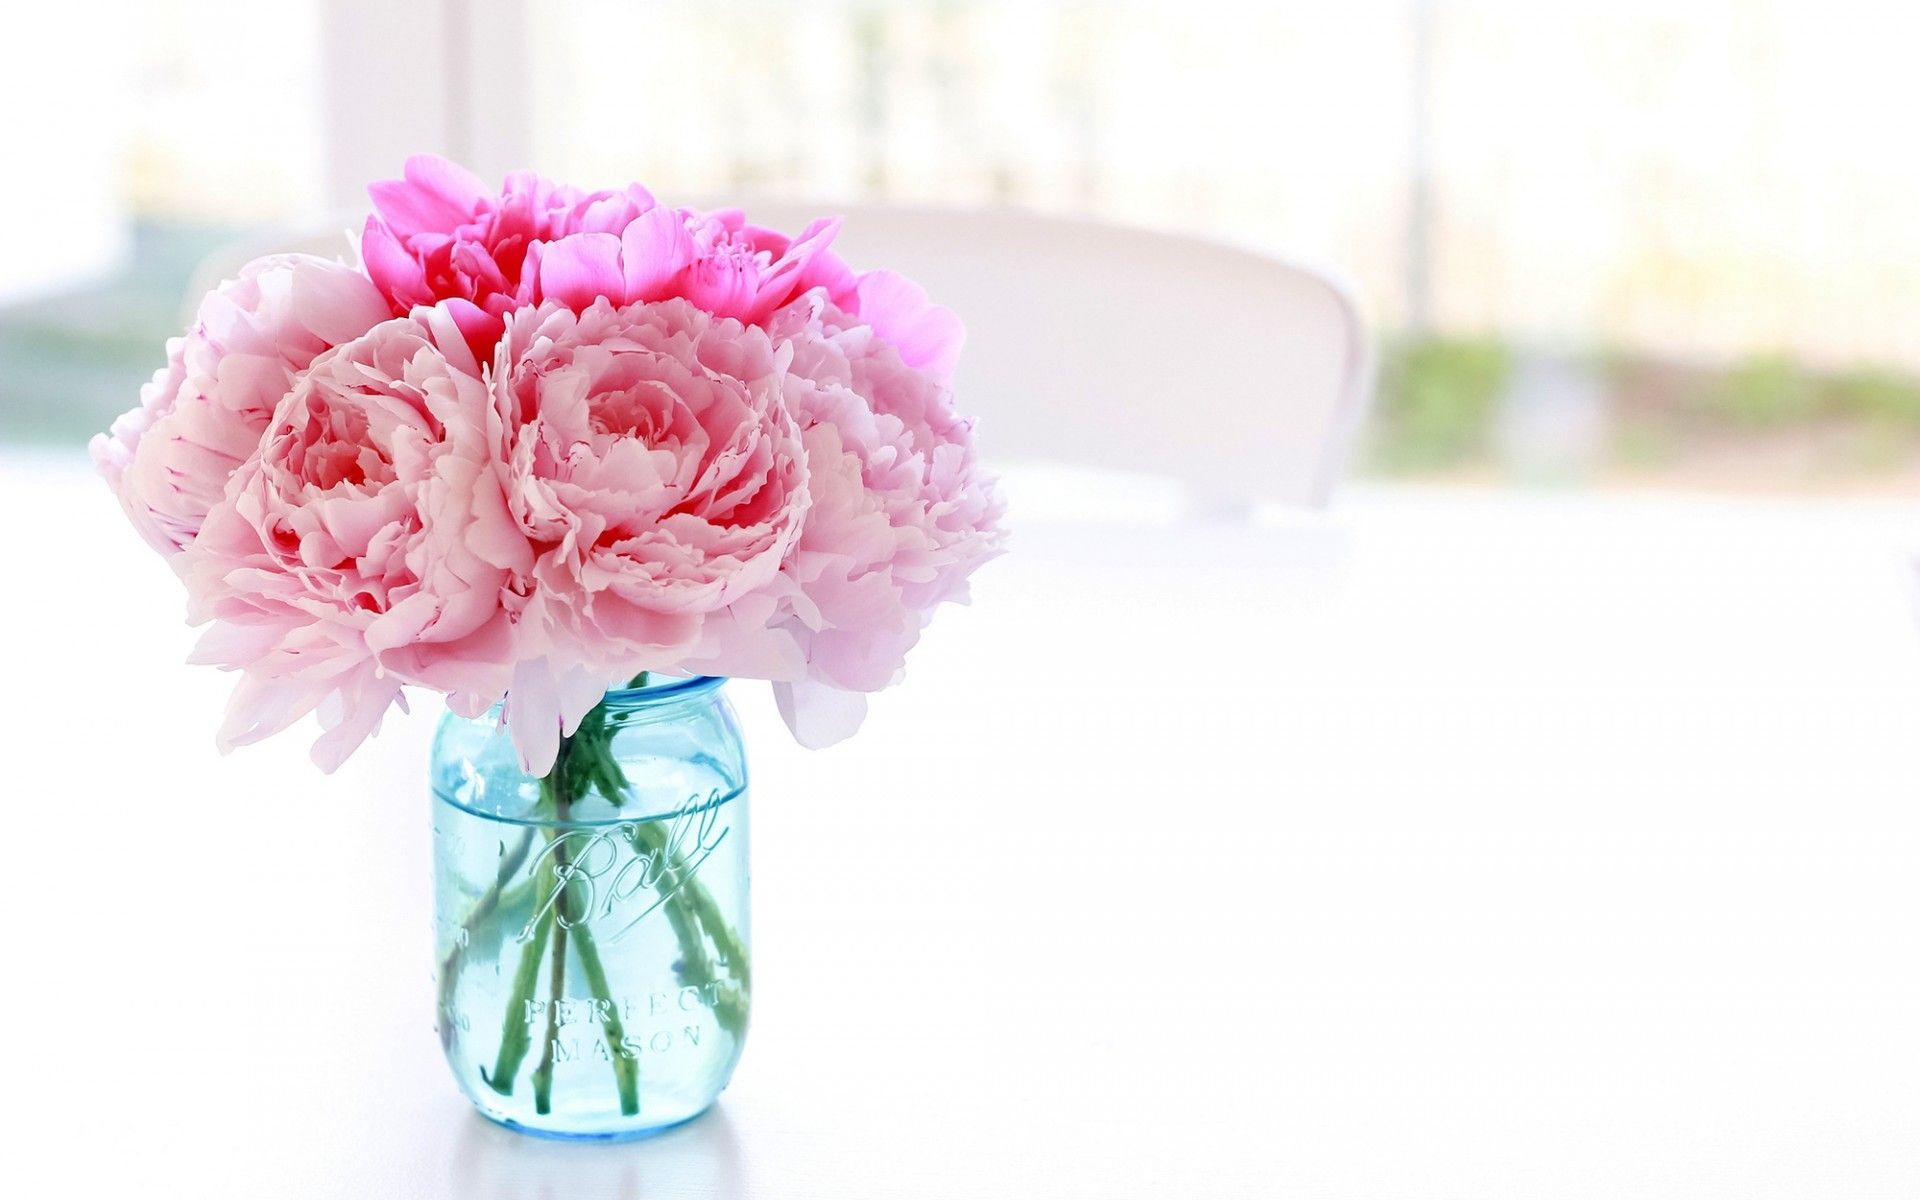 Download Wallpaper Peonies Flowers Pink Pot Jar Vase Blue Table Chair Flowers Resolution 1920x1200 Peony Wallpaper Pink Flowers Flowers Fantastic flower vase wallpaper images